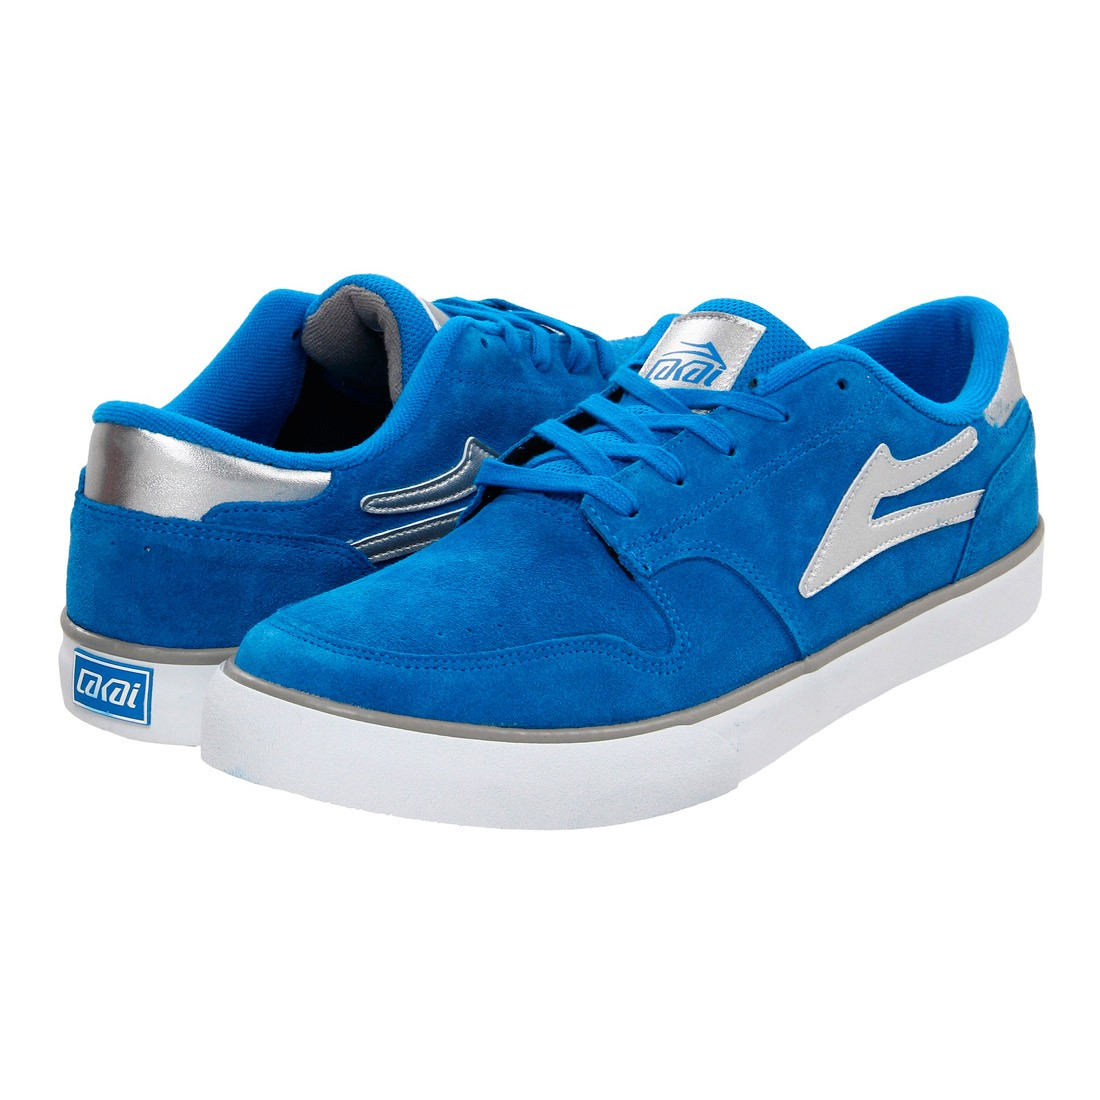 carroll 5 blue suede